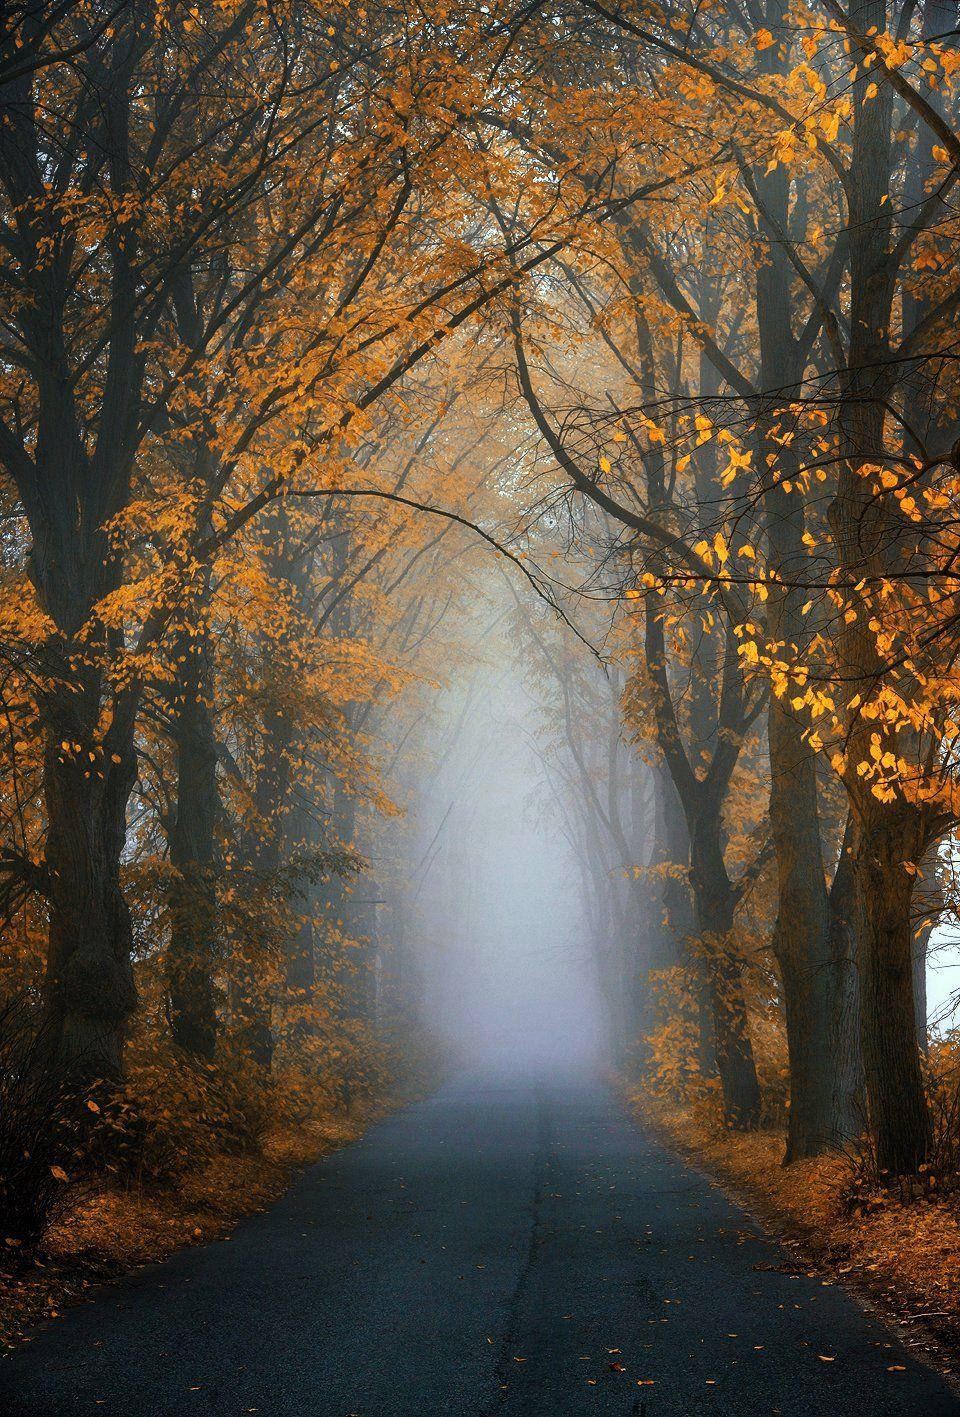 foggy road trees yellow blue leafs path misty magic autumn fall, Radoslaw Dranikowski